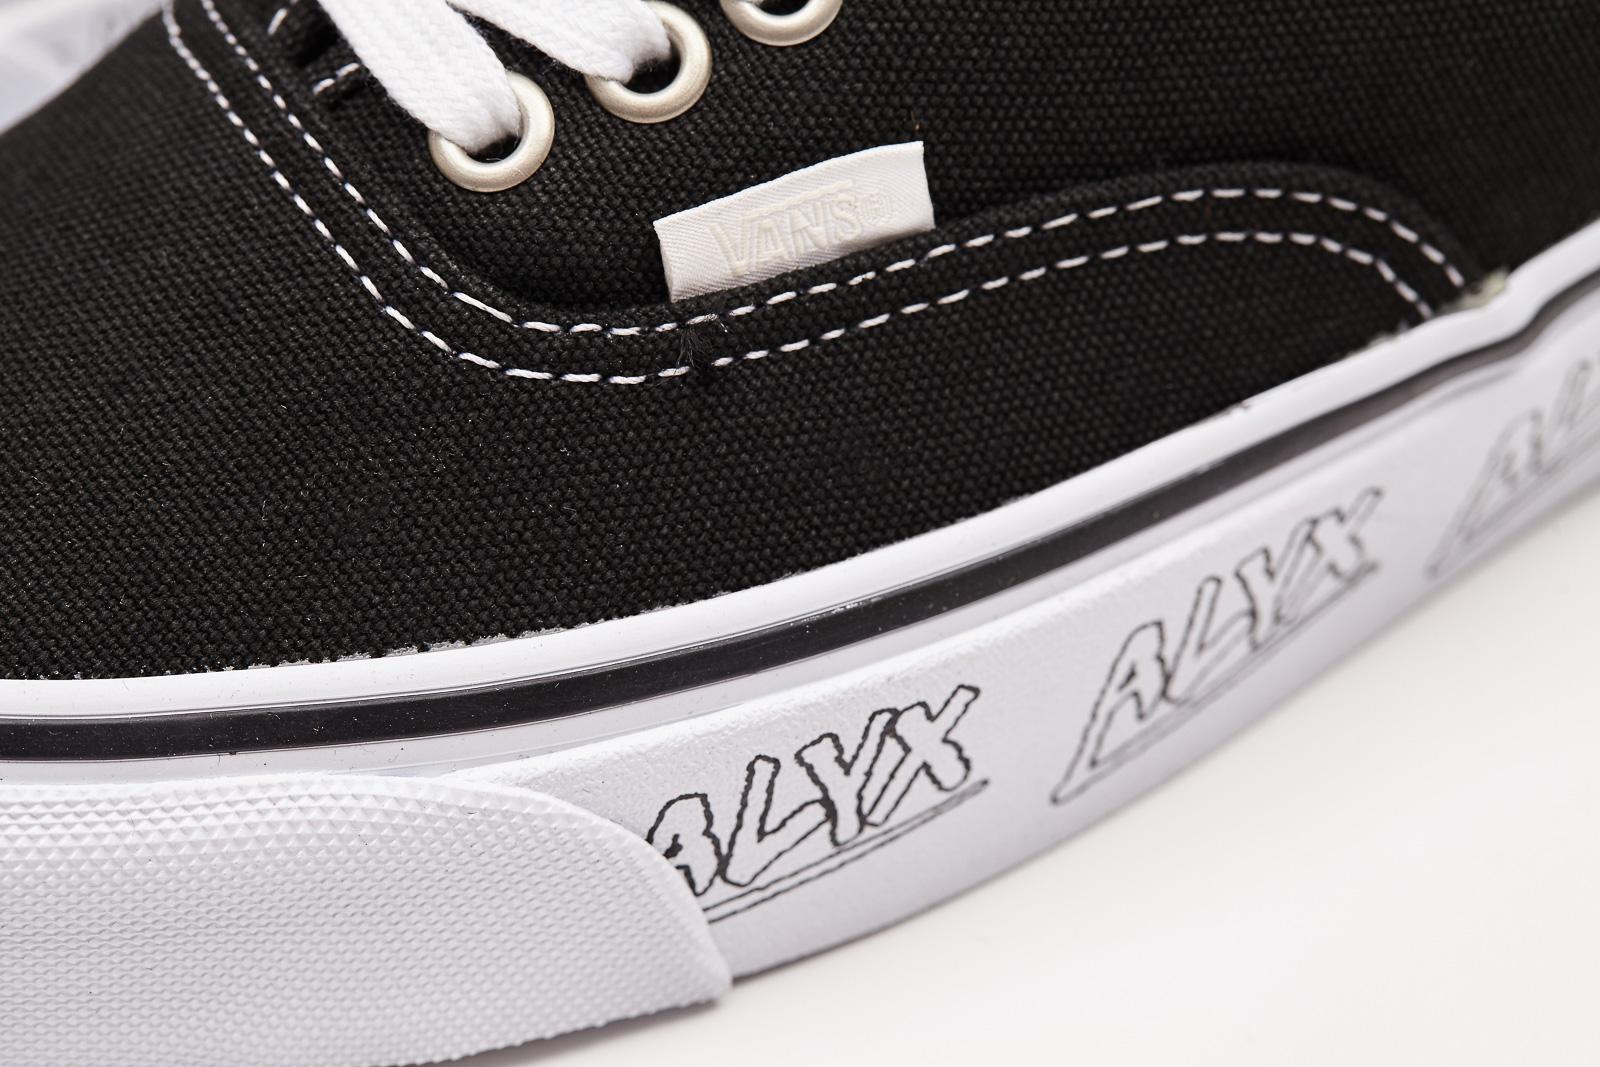 59ba65b692ad2c Vans x ALYX Authentic Sneakers - KM20 Online Store